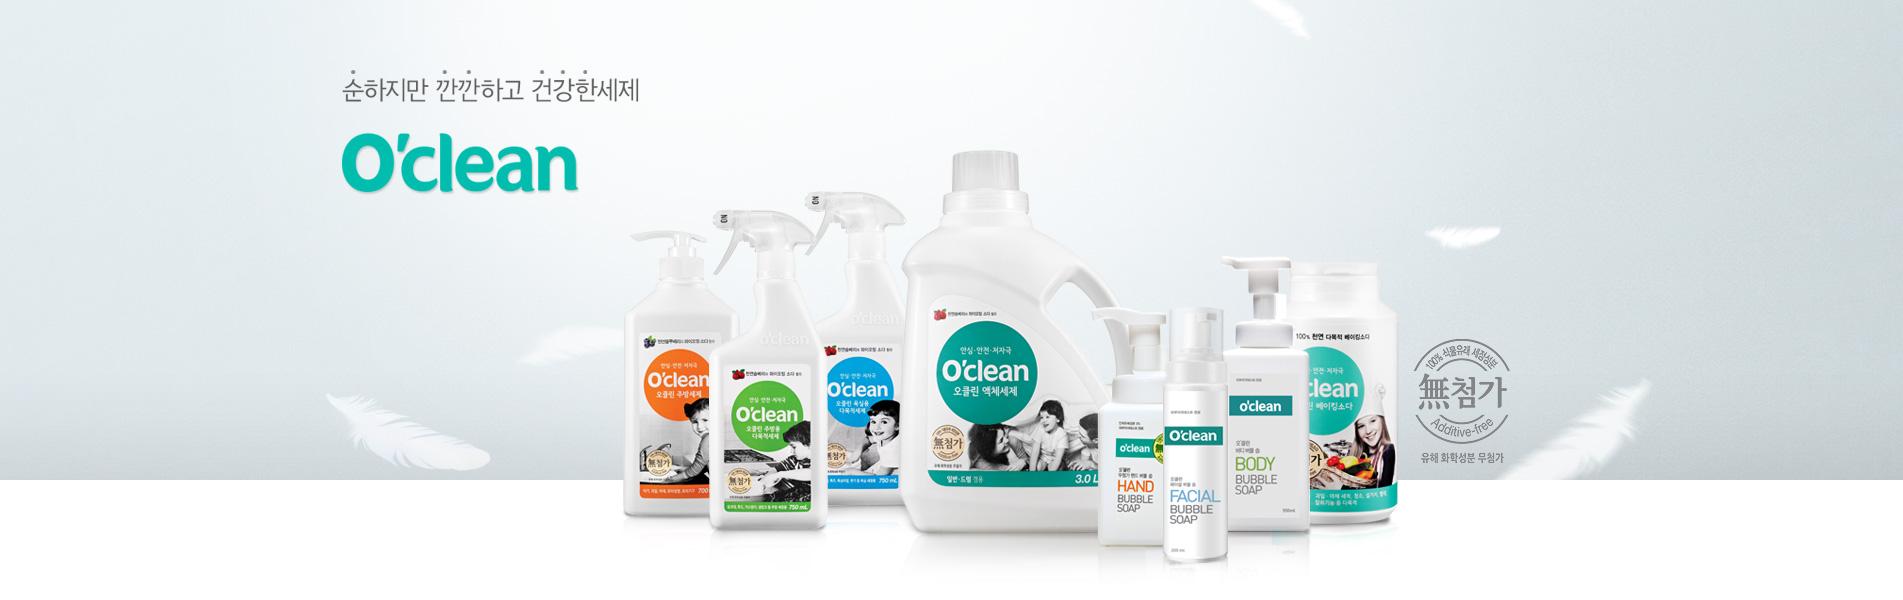 brand-oclean-top